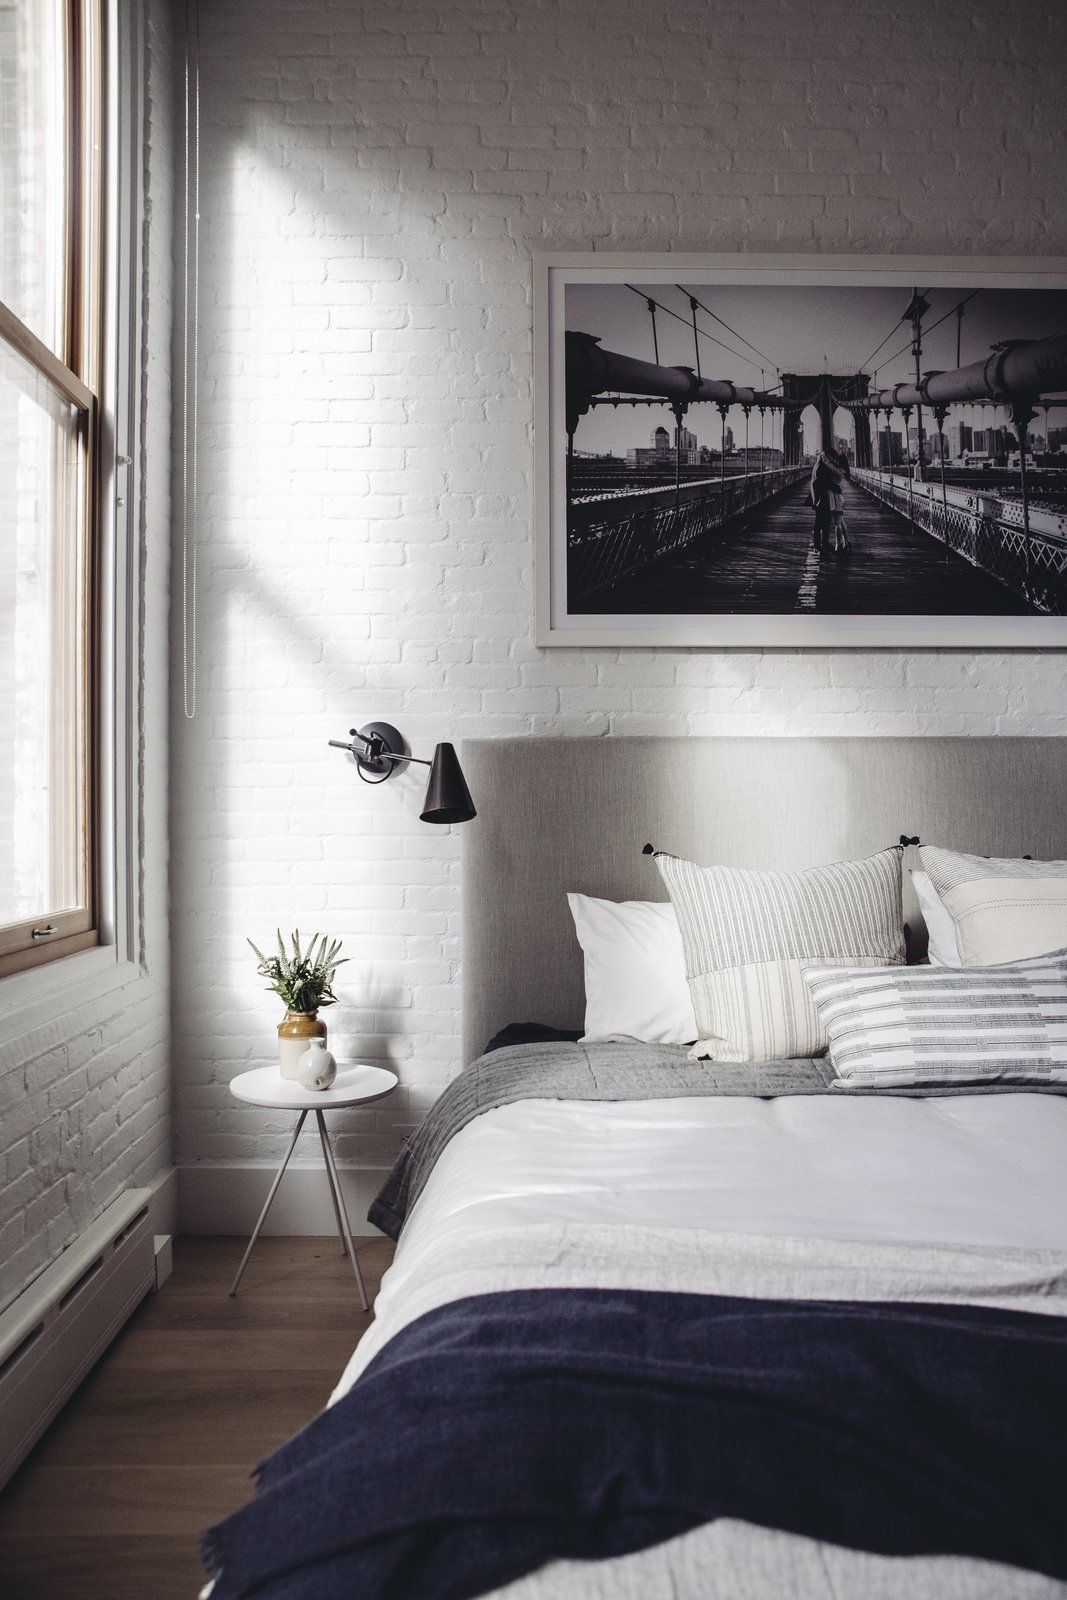 SoHo loft bedroom with white exposed brick